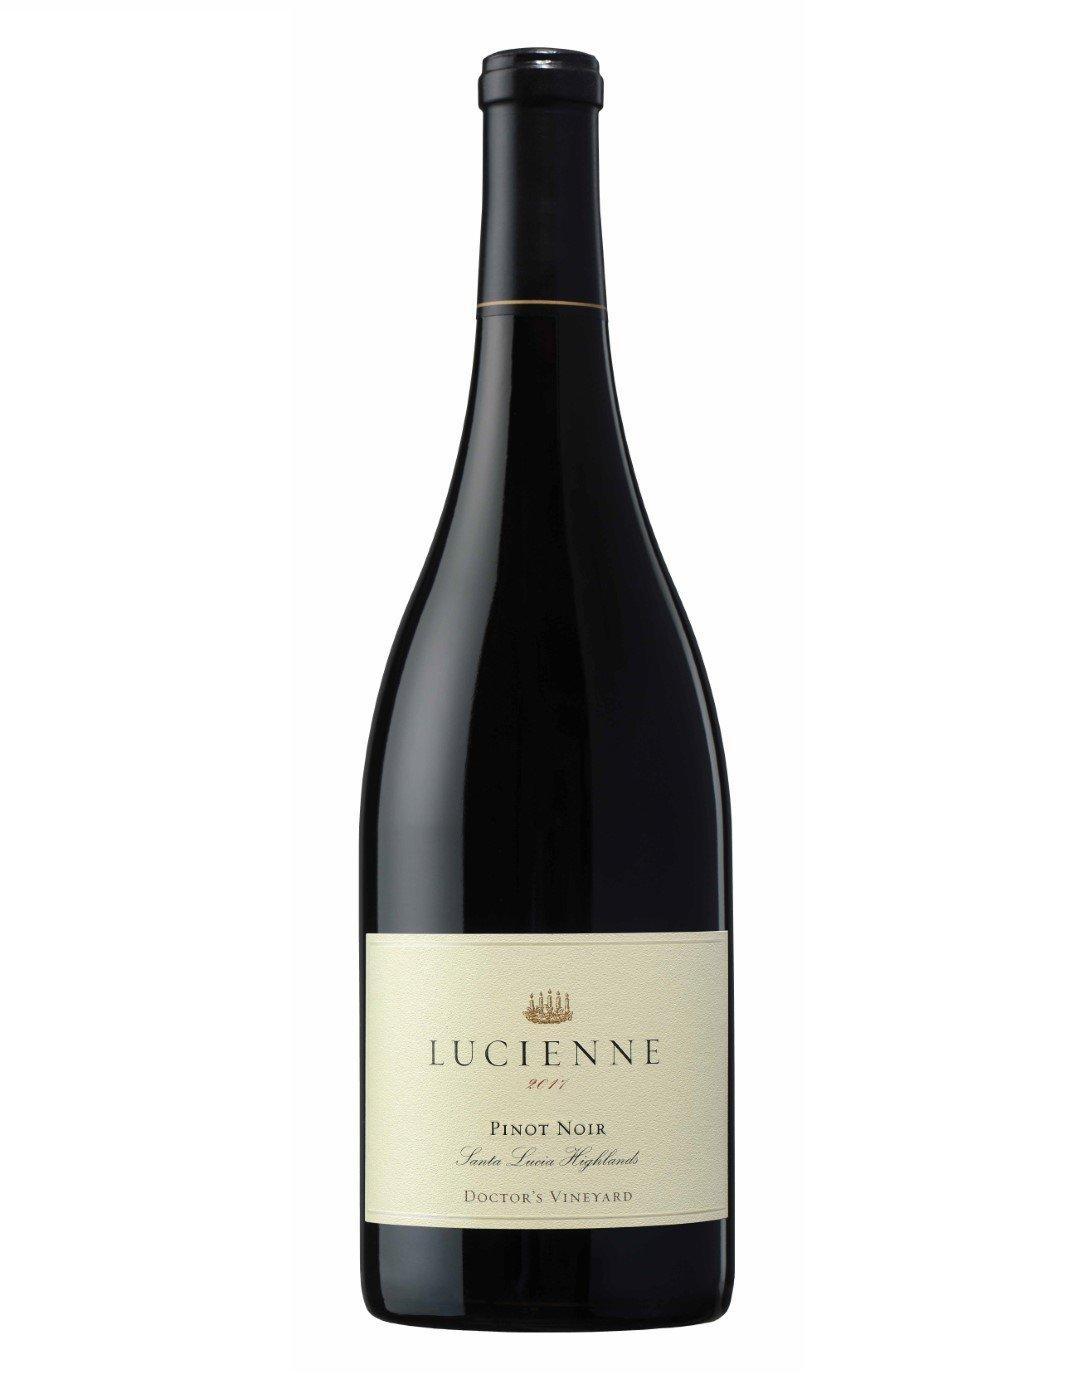 2017 Lucienne Pinot Noir Doctor's Vineyard